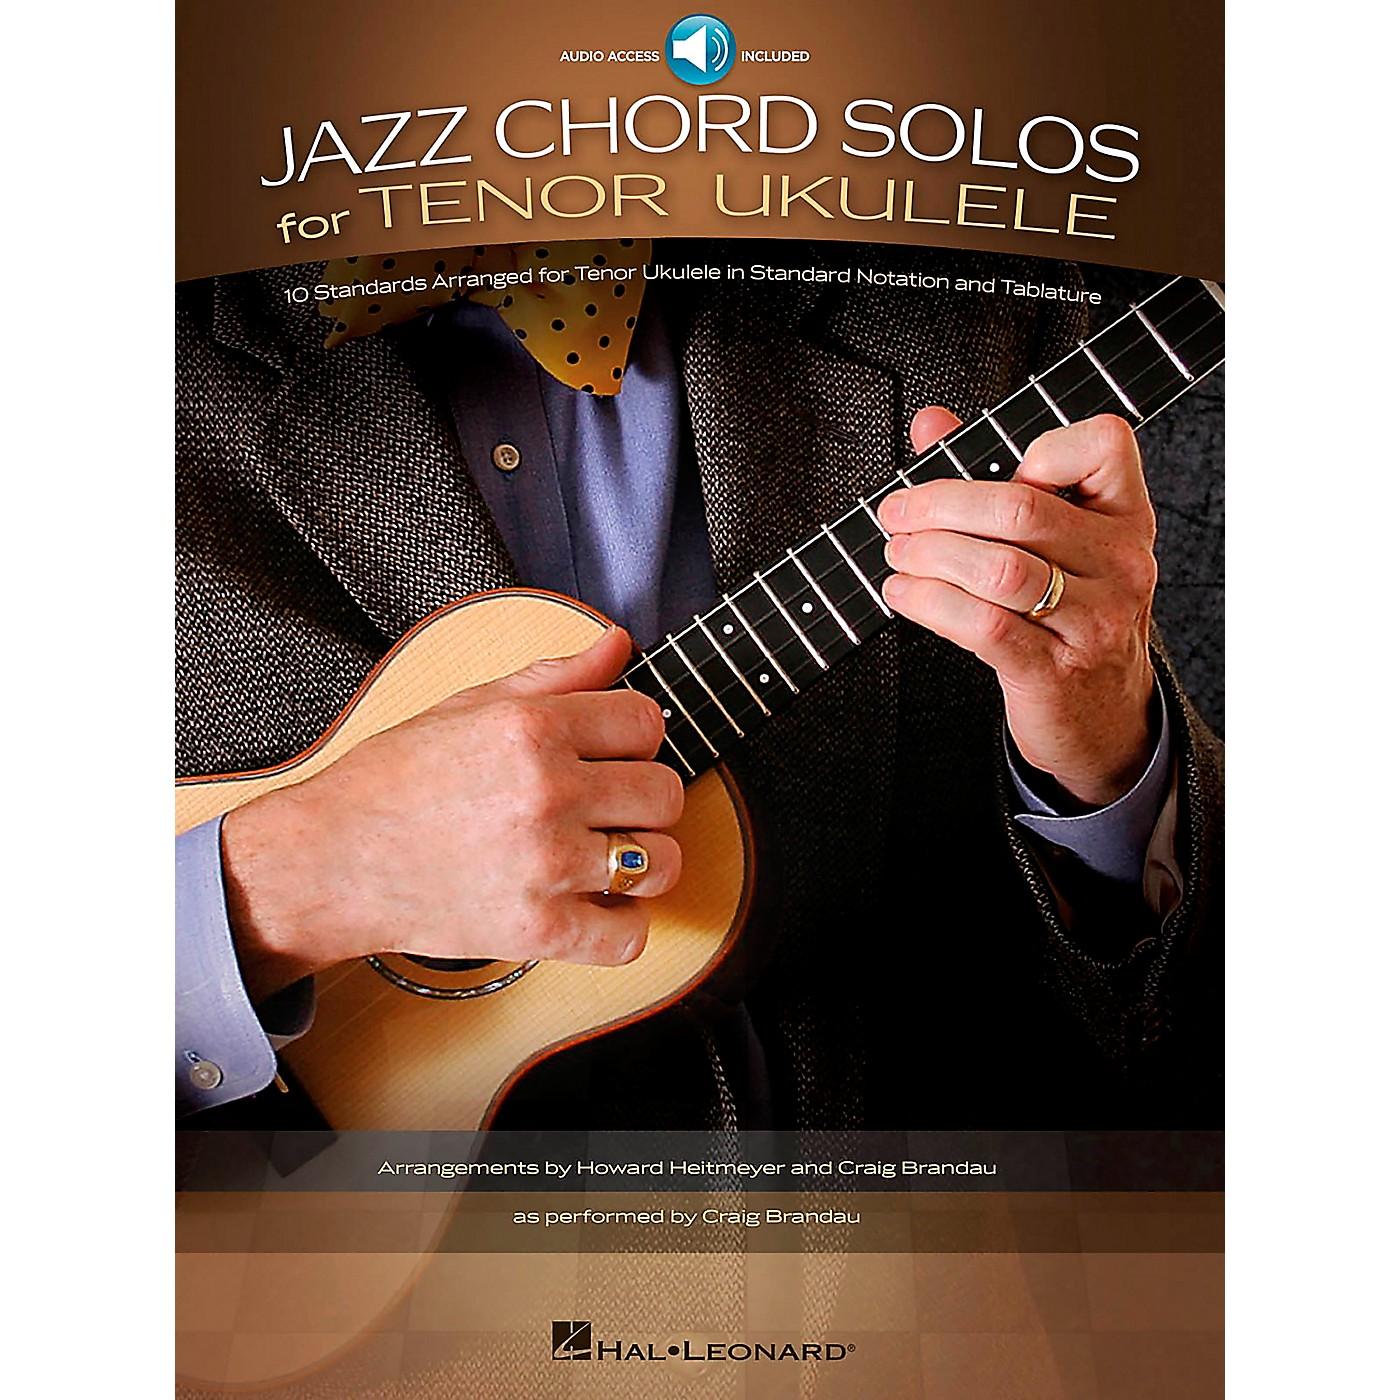 Hal Leonard Jazz Chord Solos For Tenor Ukulele - 10 Standards Arranged For Tenor Ukulele (Book/Online Audio) thumbnail